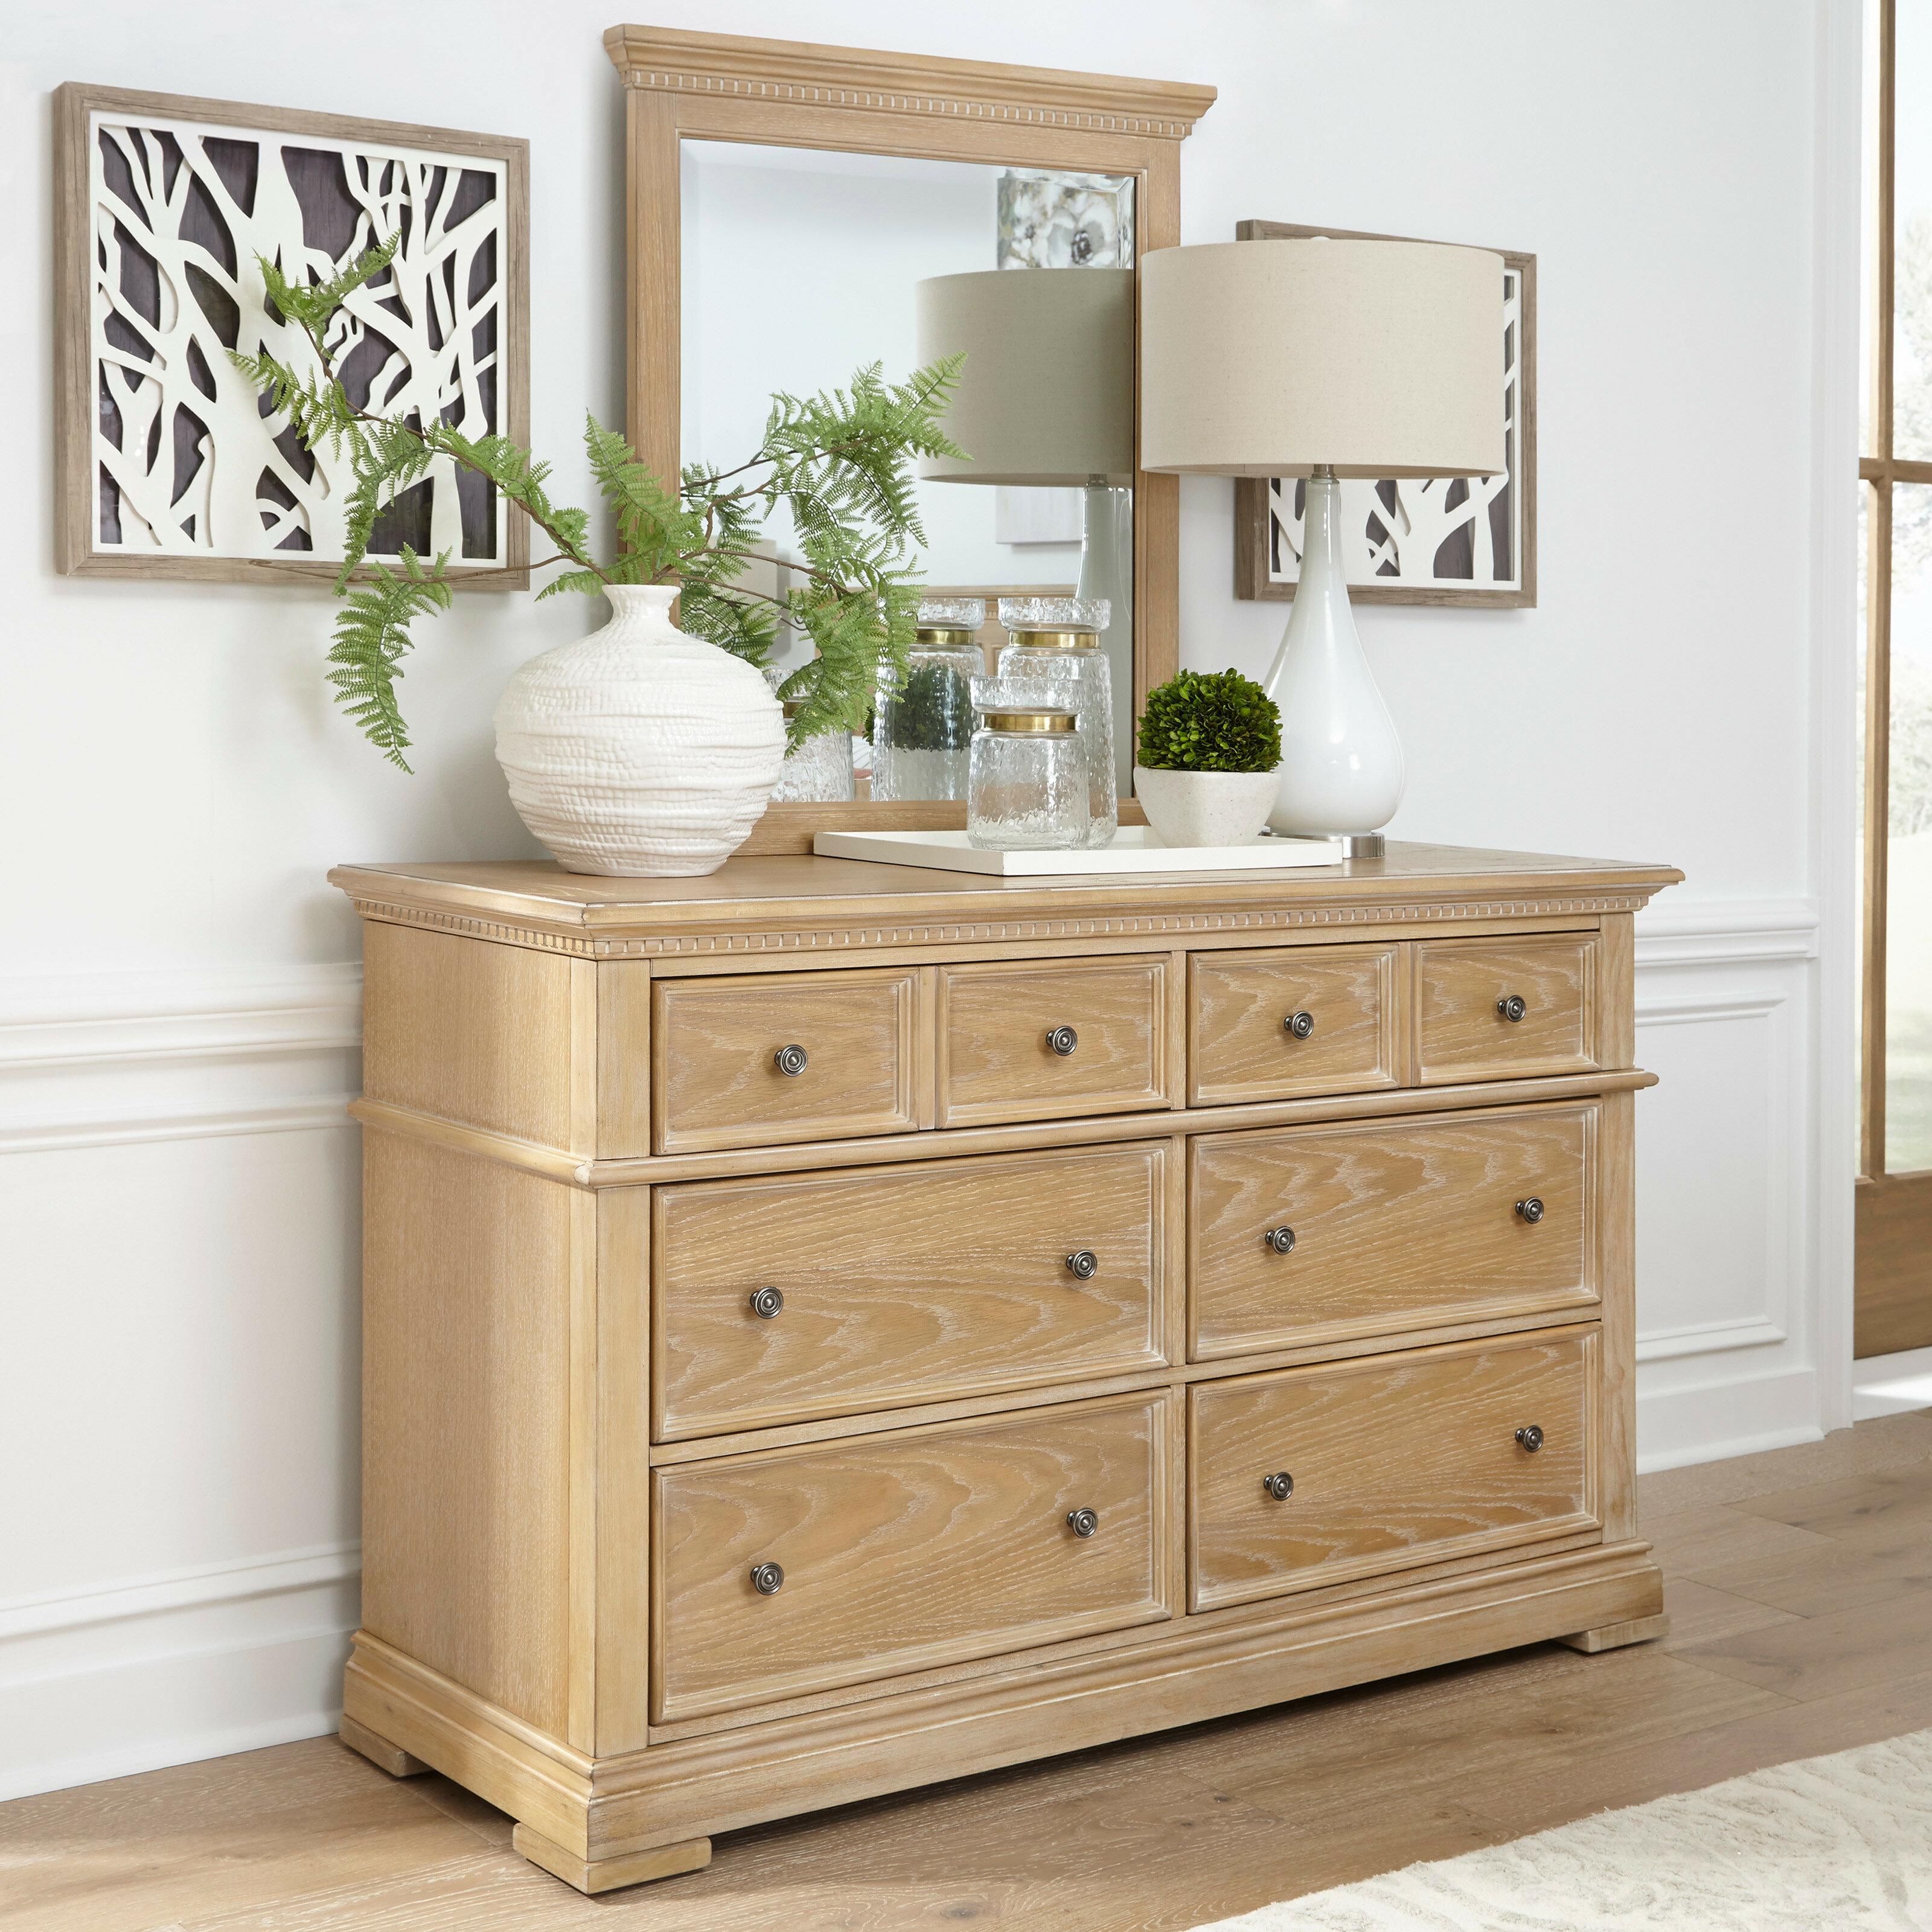 millsap 6 drawer double dresser with mirror